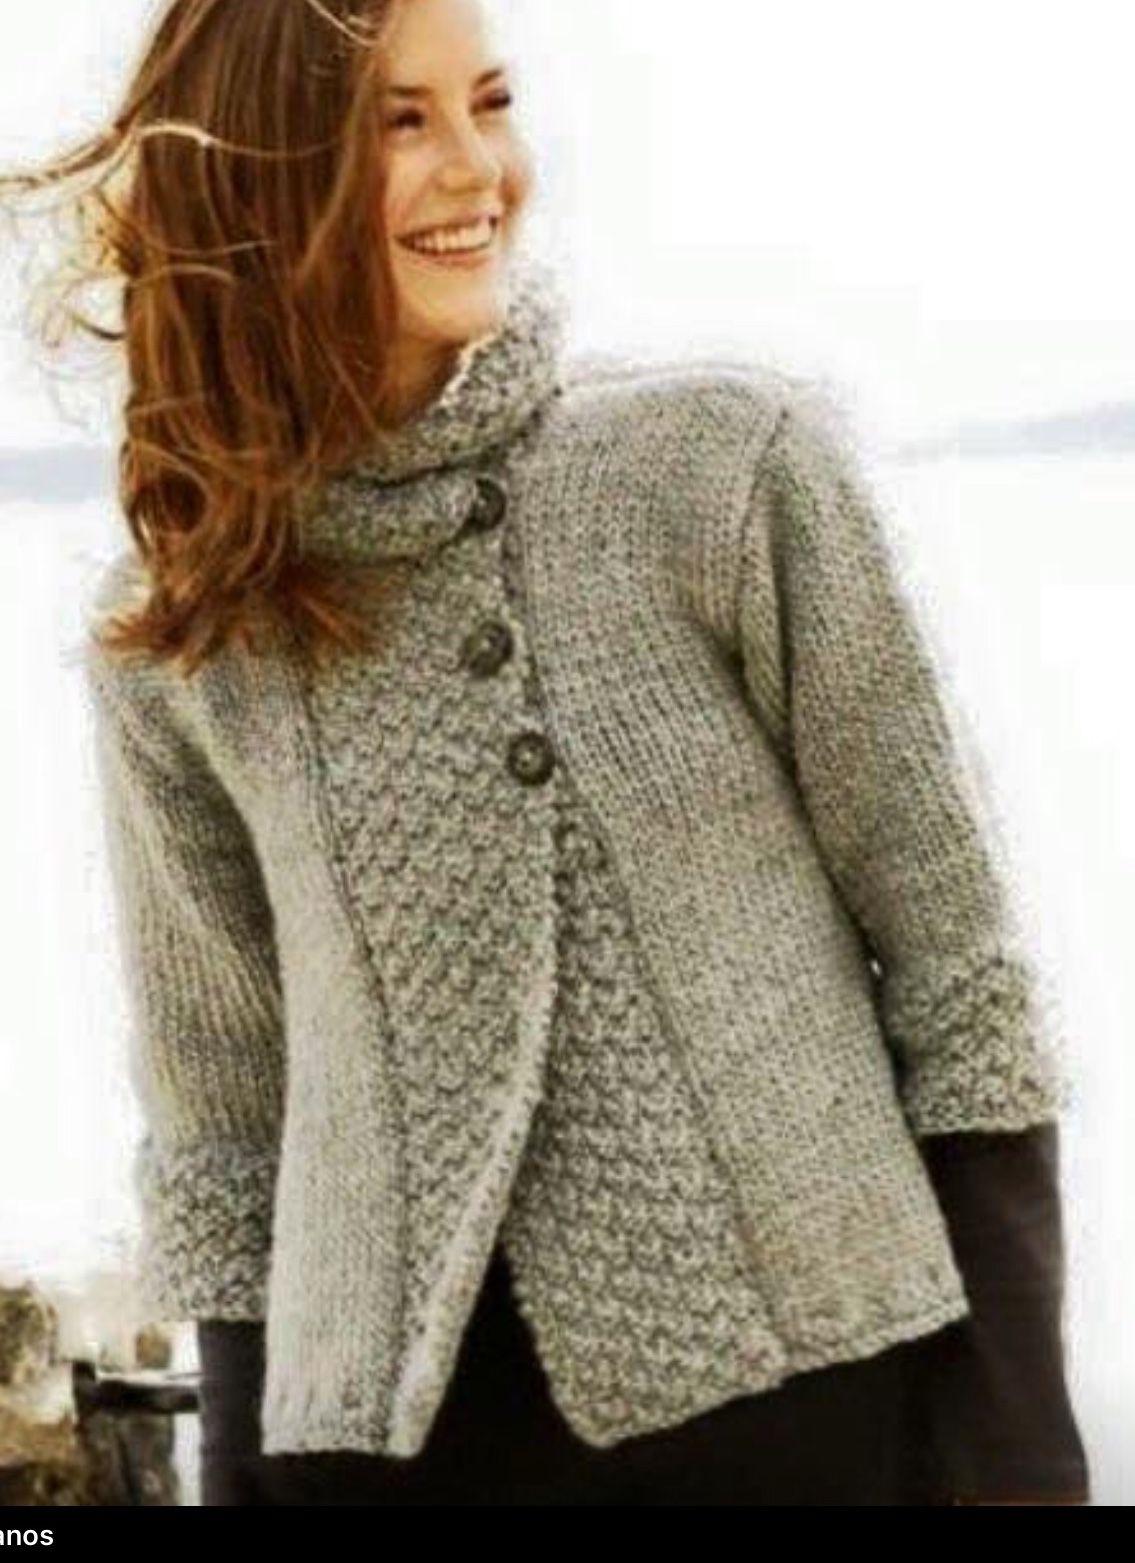 Winter jacket wool jacket handknit winter cardigan knitted alpaca grey gray jacket orange red jacket pink cardigan black jacket Lilith